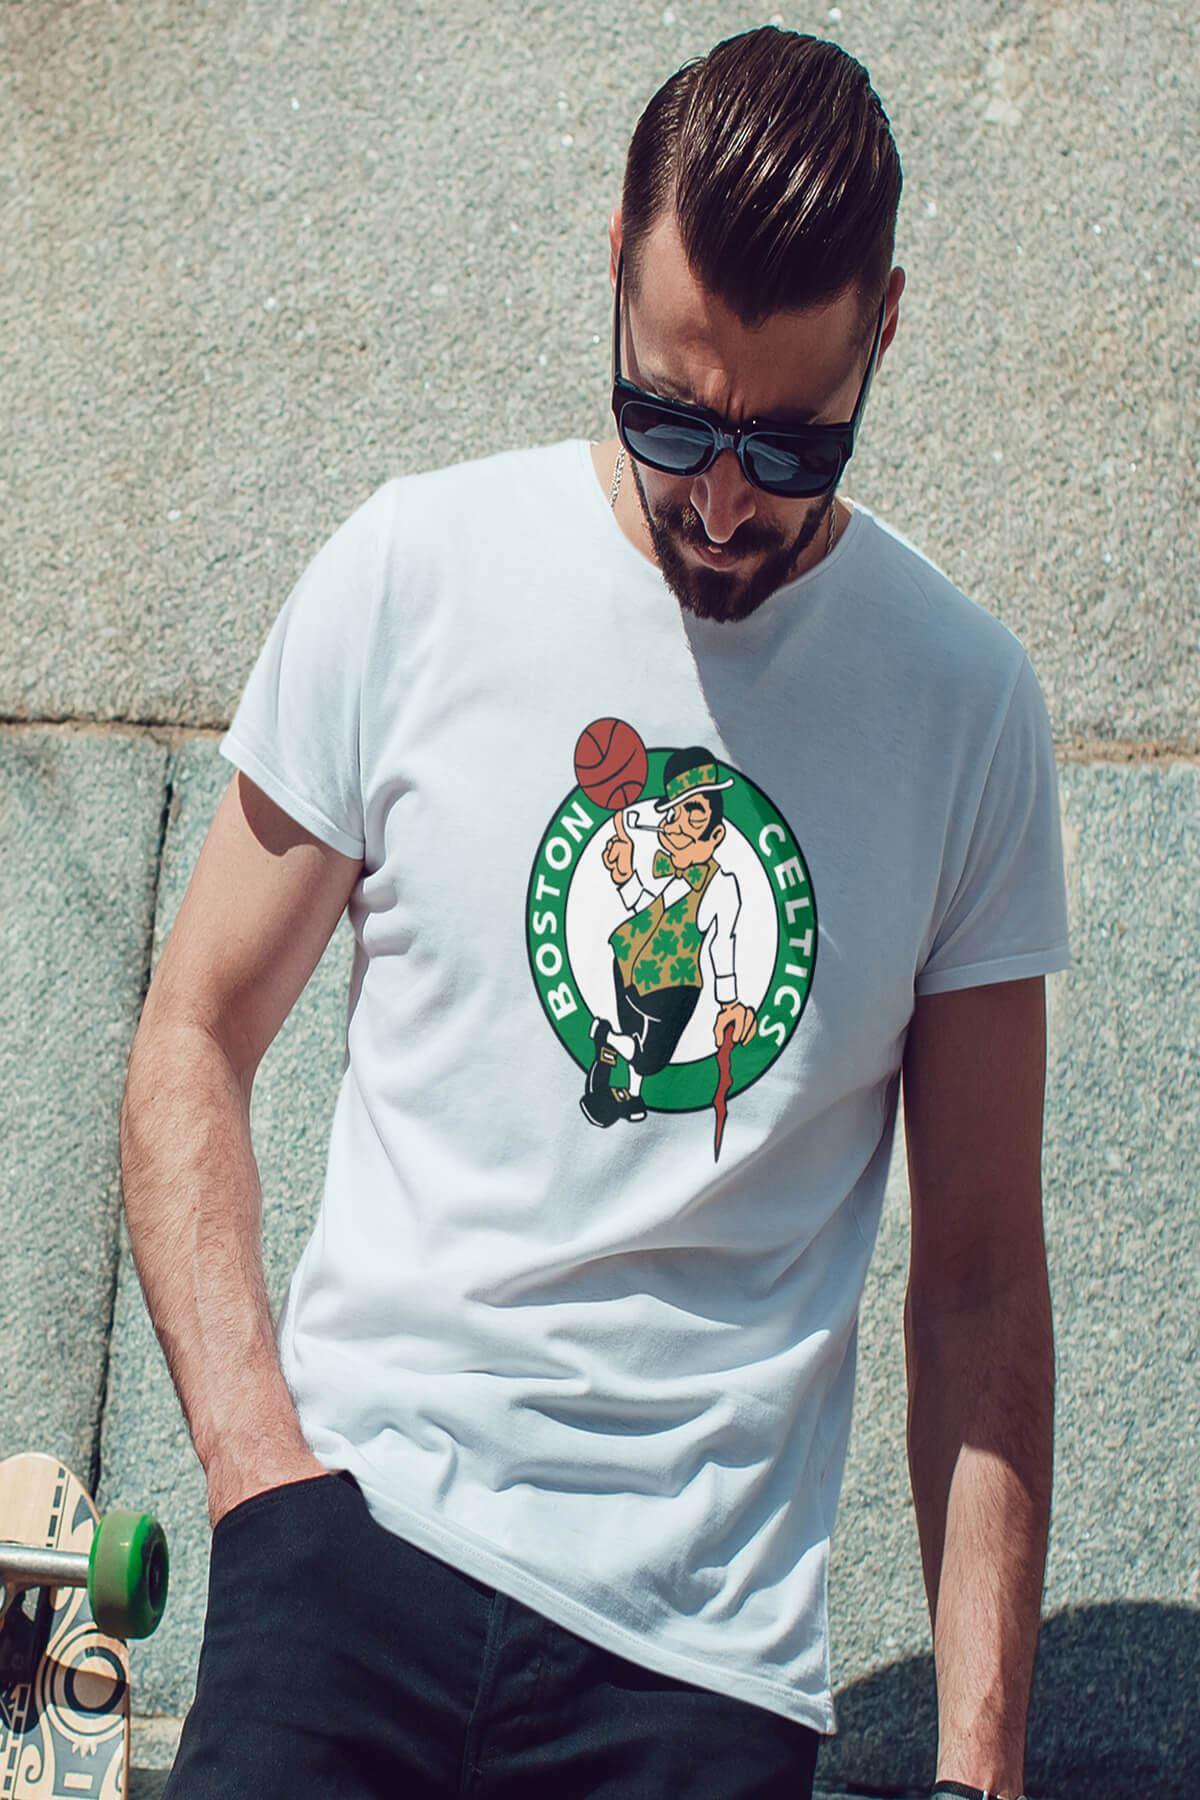 Boston Beyaz Erkek Tshirt - Tişört